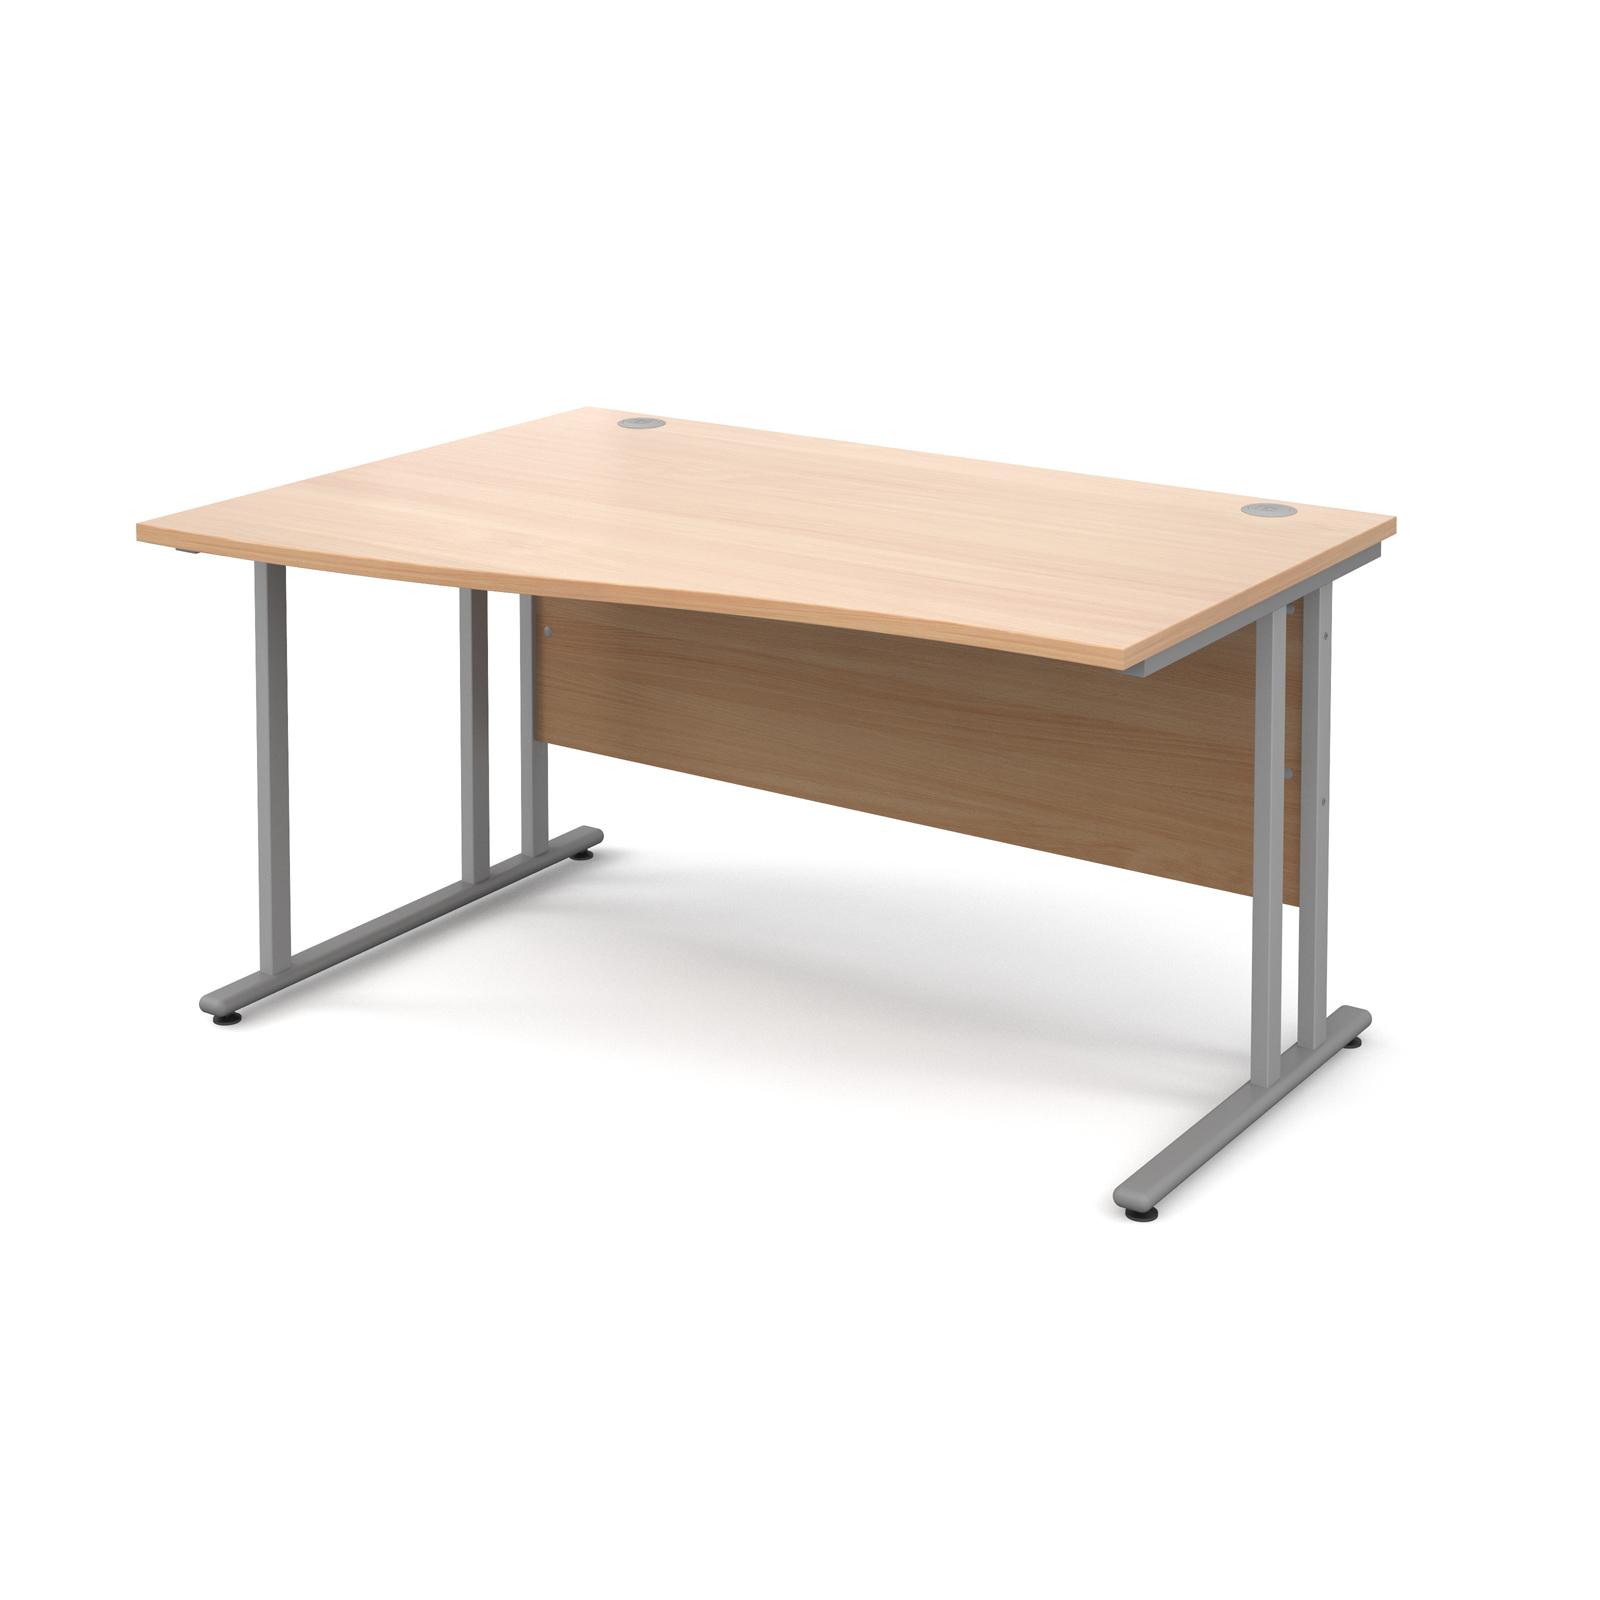 Maestro 25 SL left hand wave desk 1400mm - silver cantilever frame, beech top